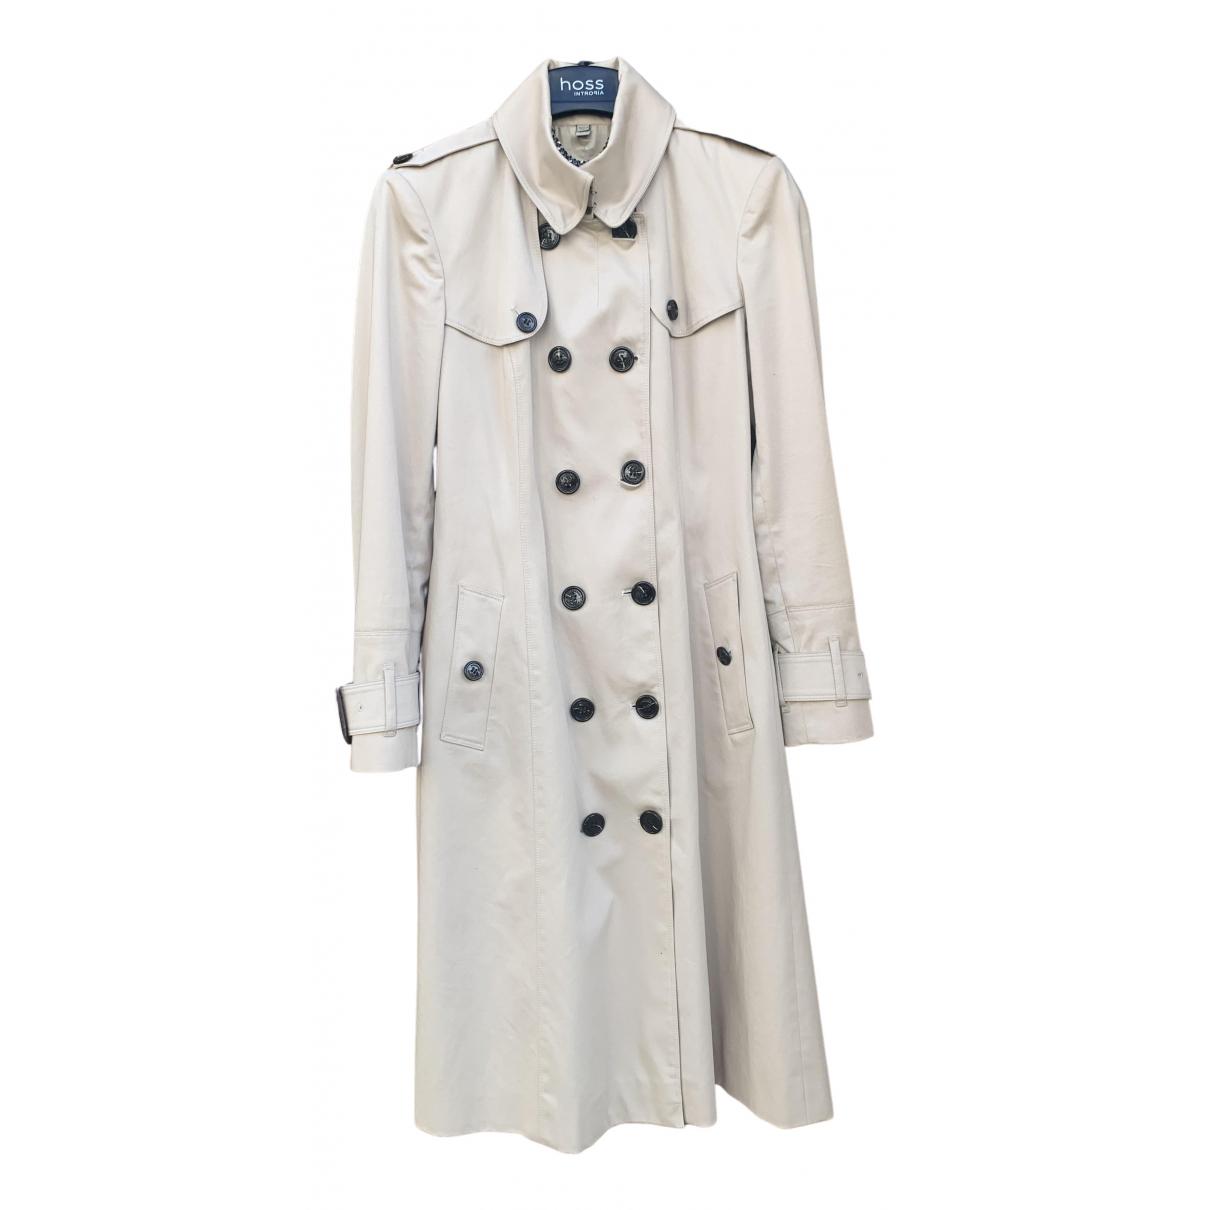 Burberry N Beige Cotton Trench coat for Women 42 IT